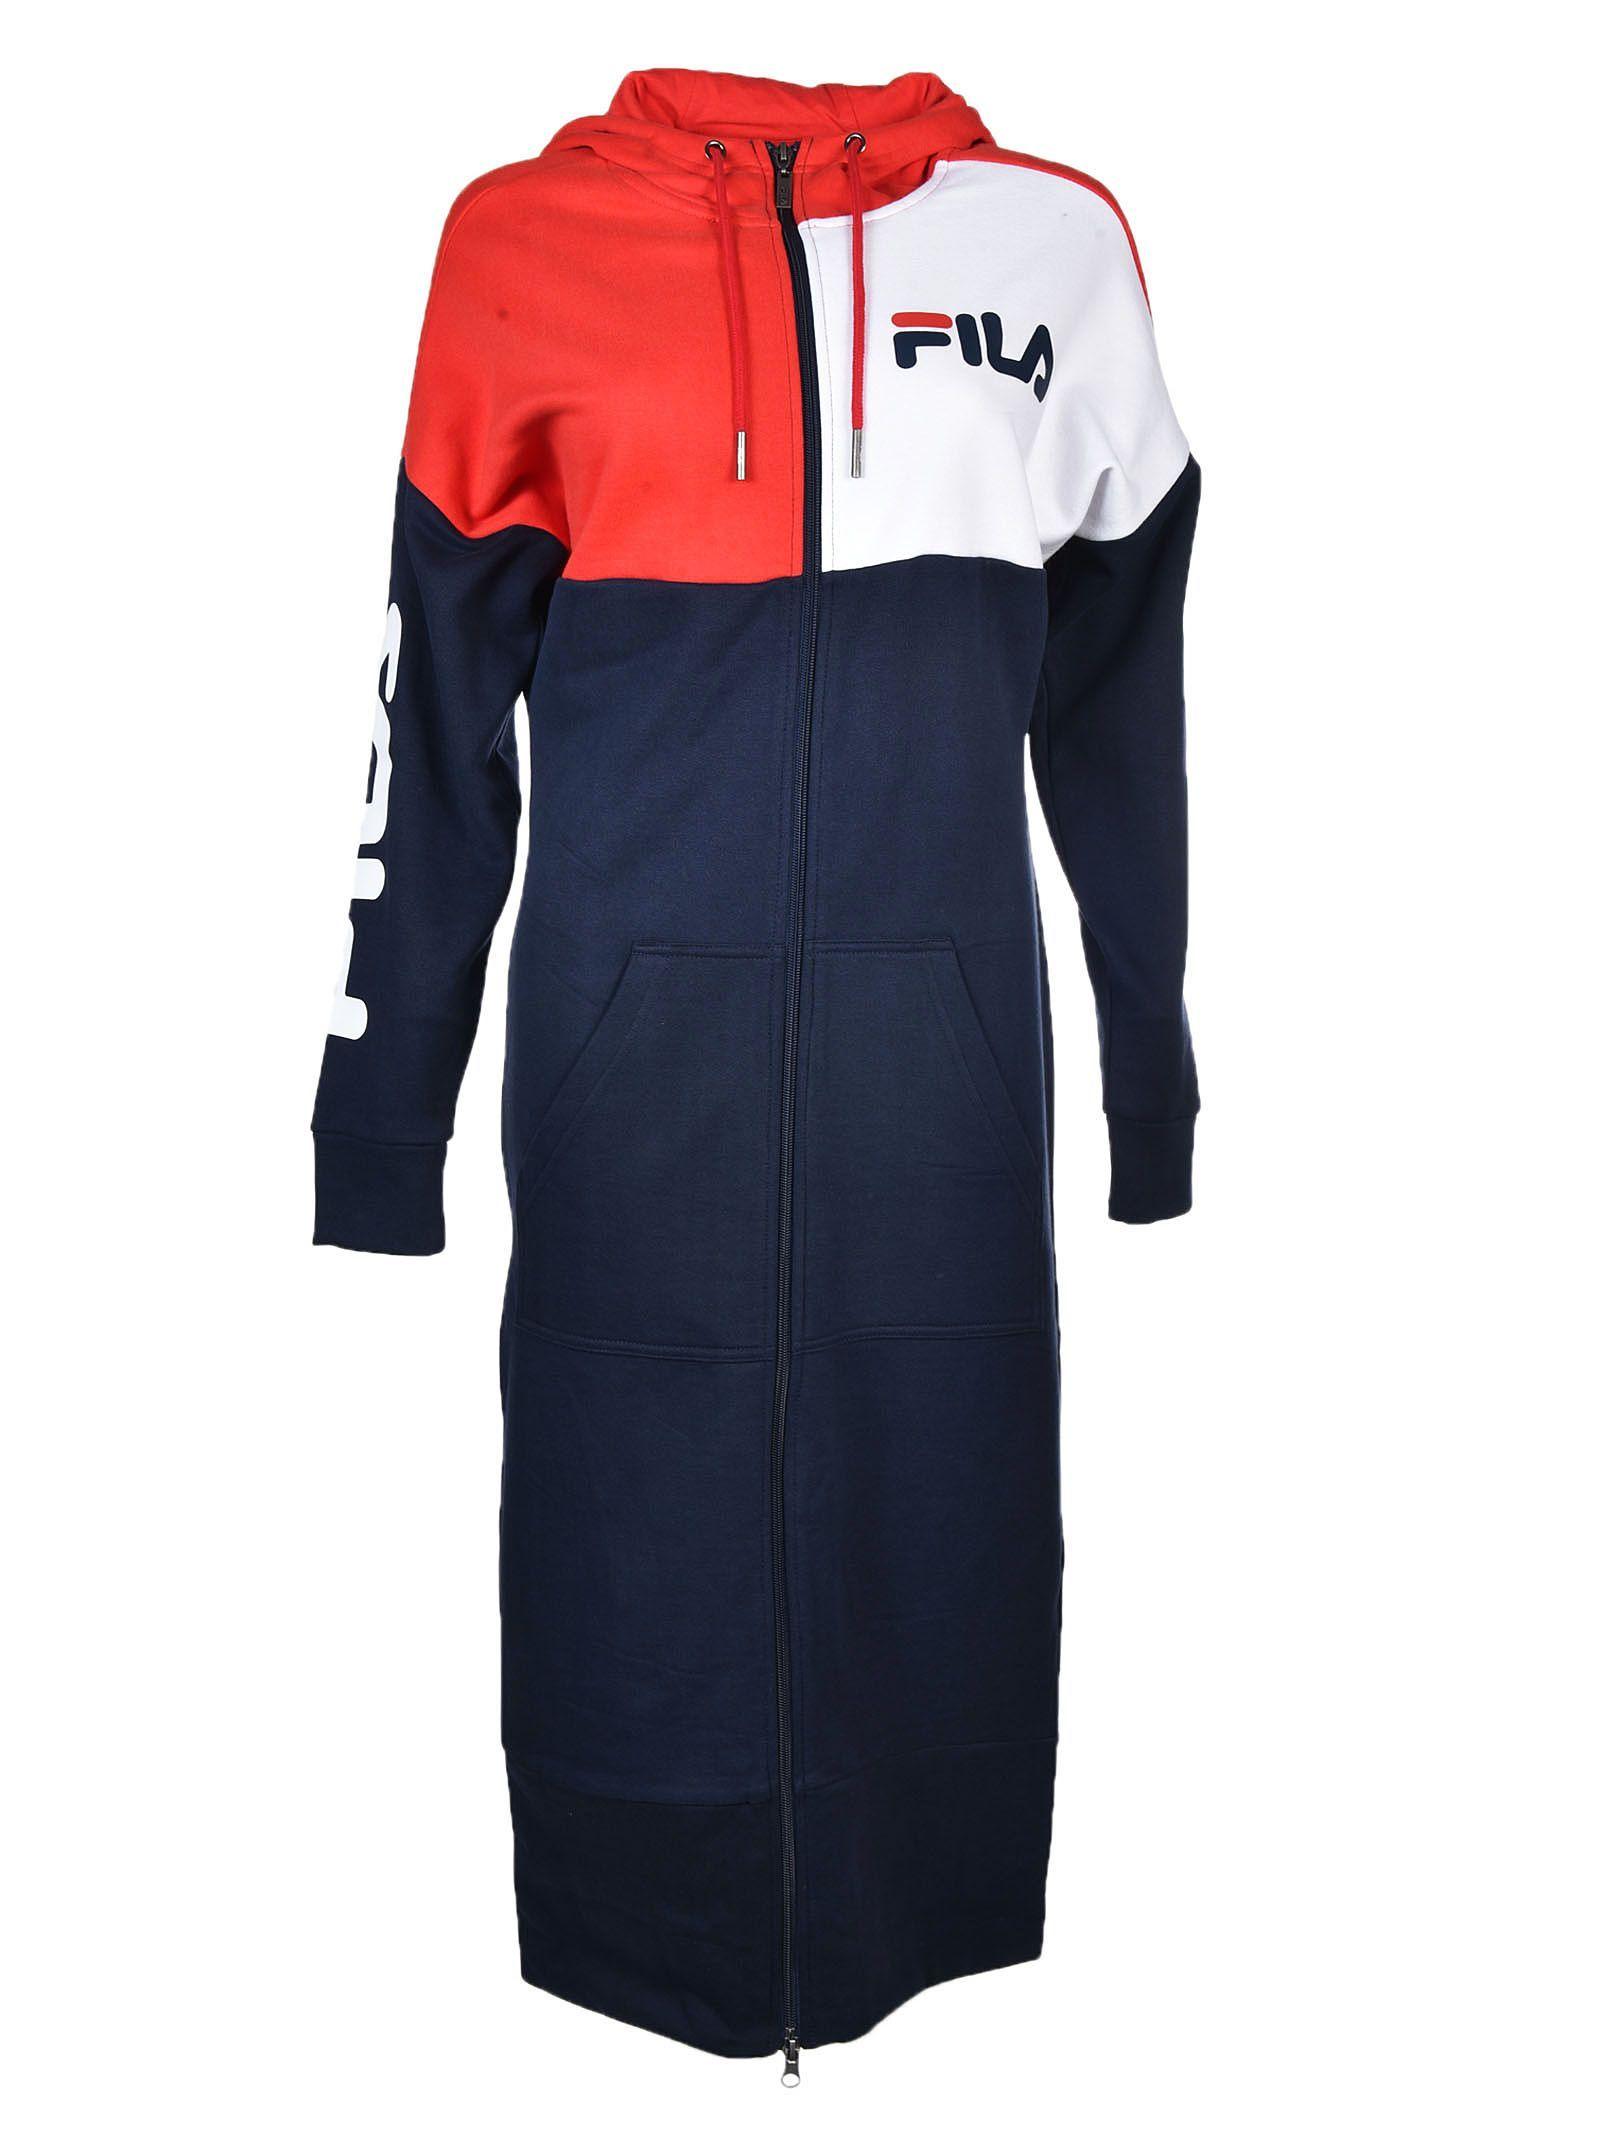 a456cccf5f FILA ALVA LONGSLEEVED DRESS. #fila #cloth # | Fila | Fila dress ...